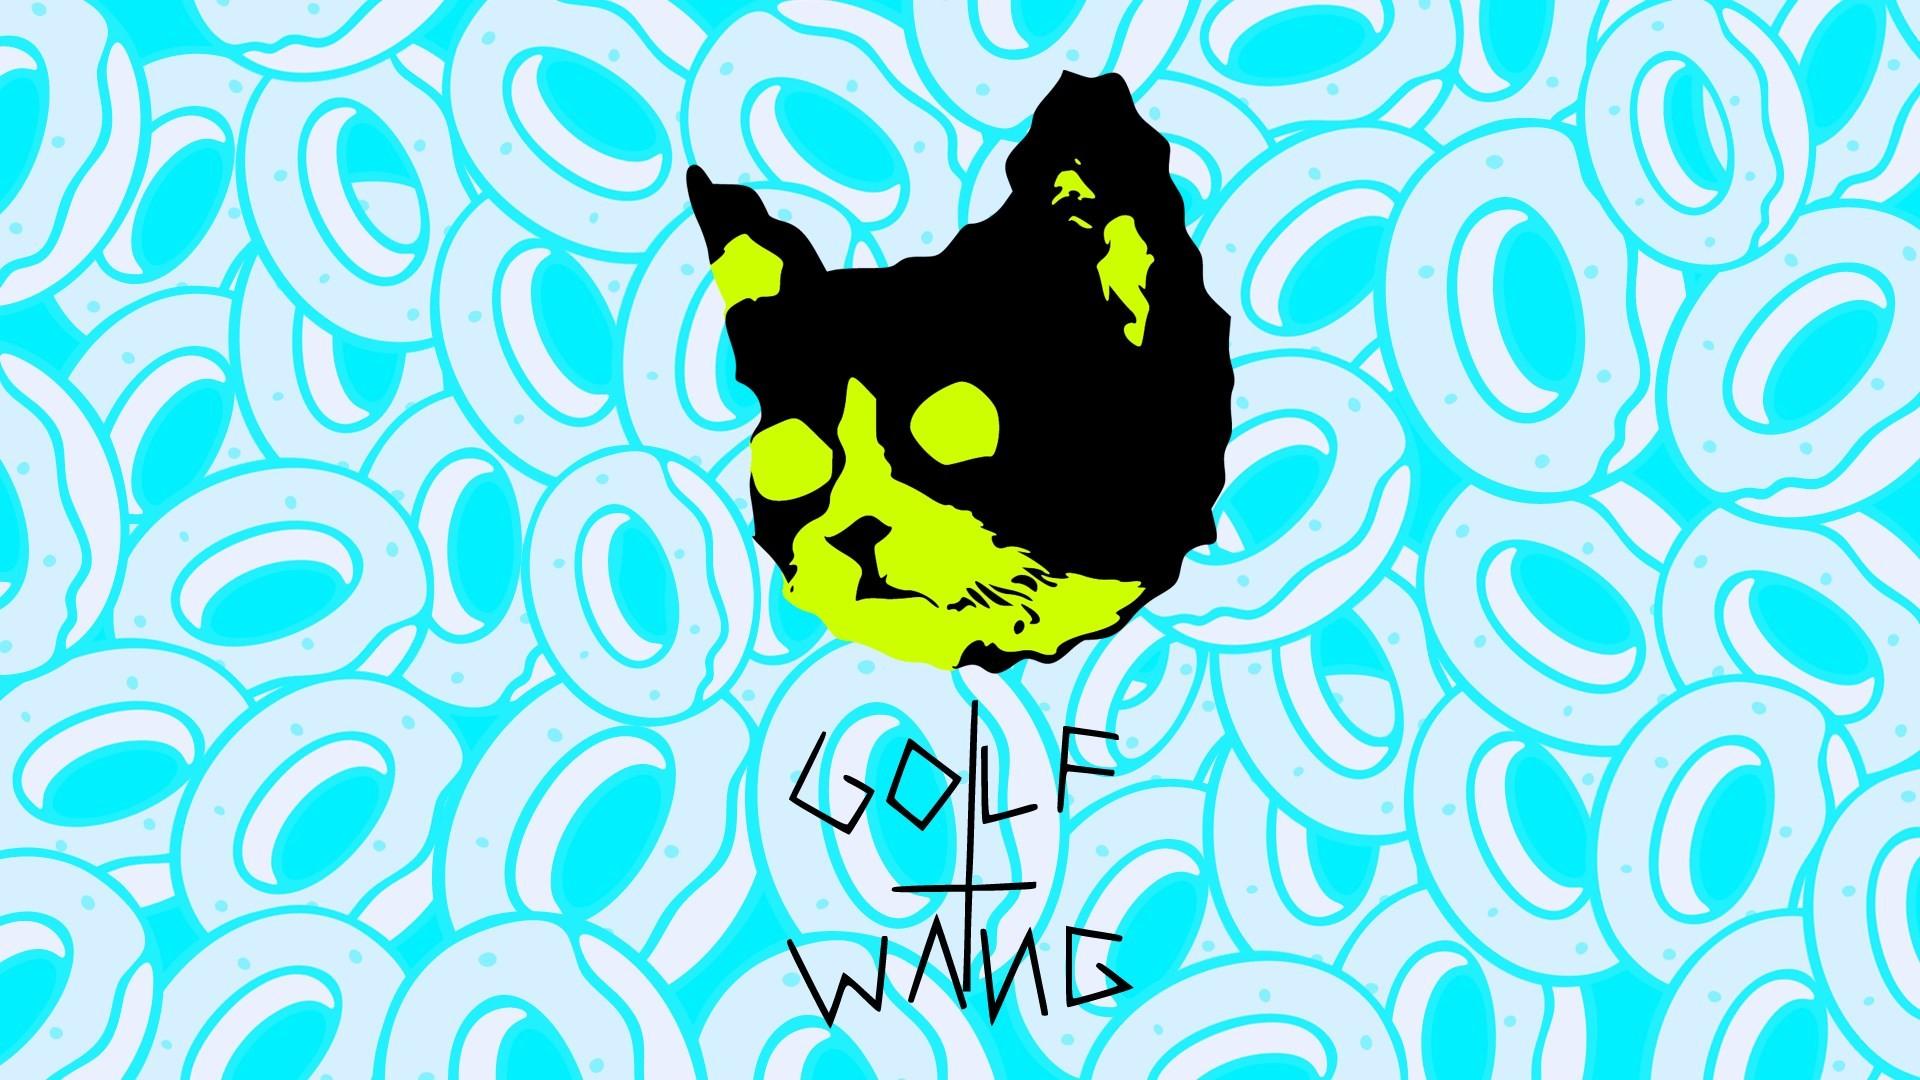 golf wang cat wallpaper …